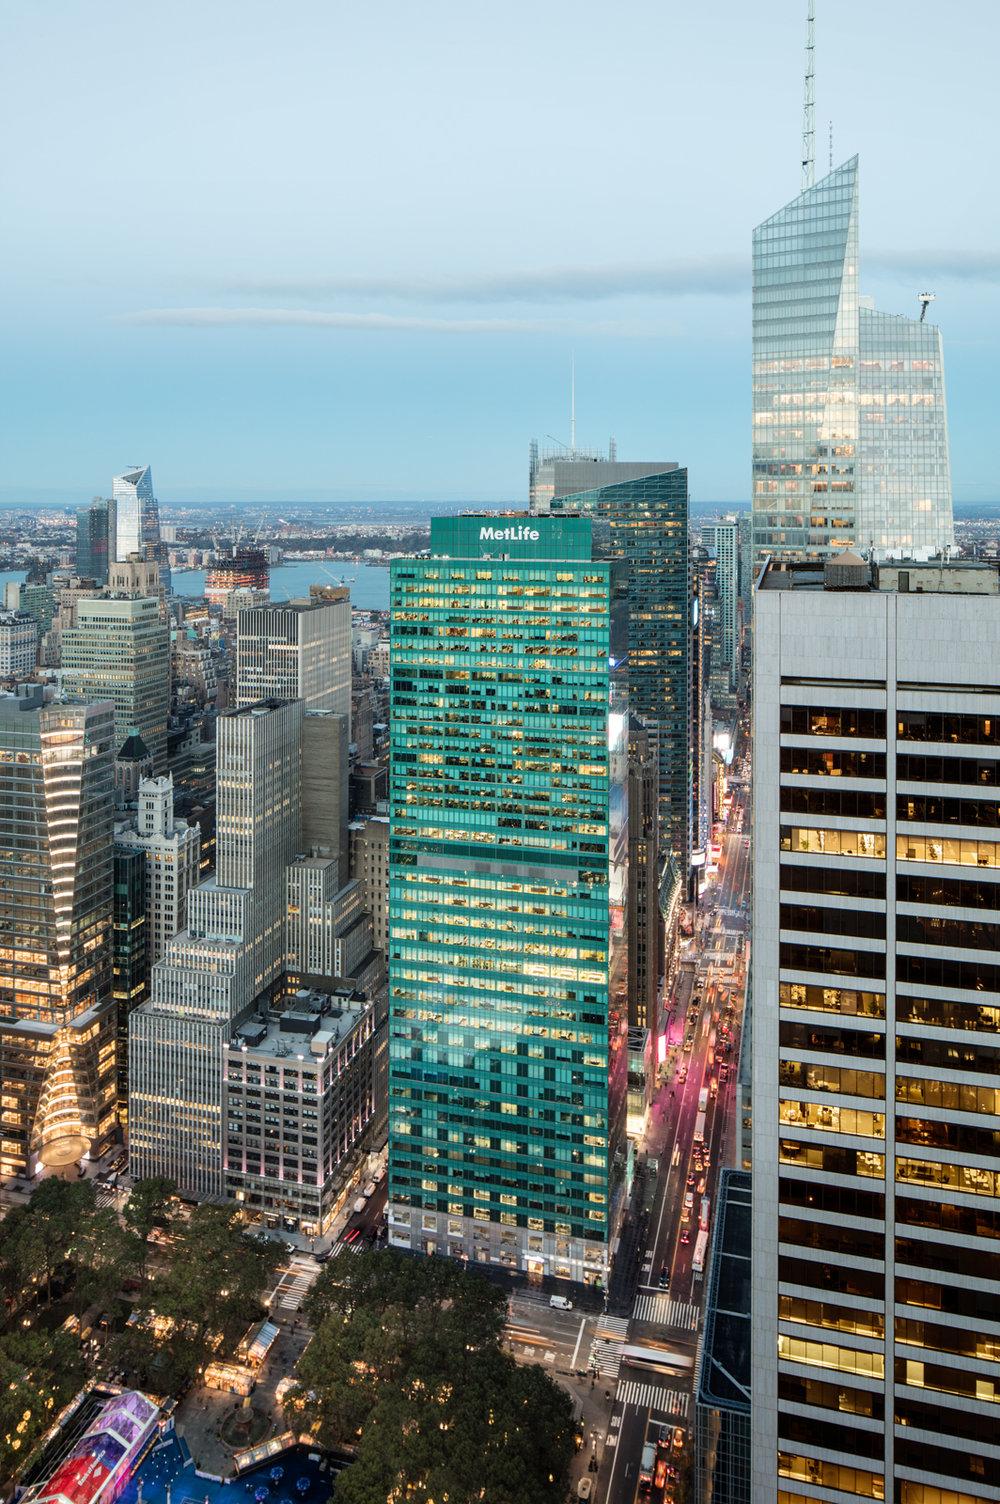 Met Life bldg now Salesforce Tower NY